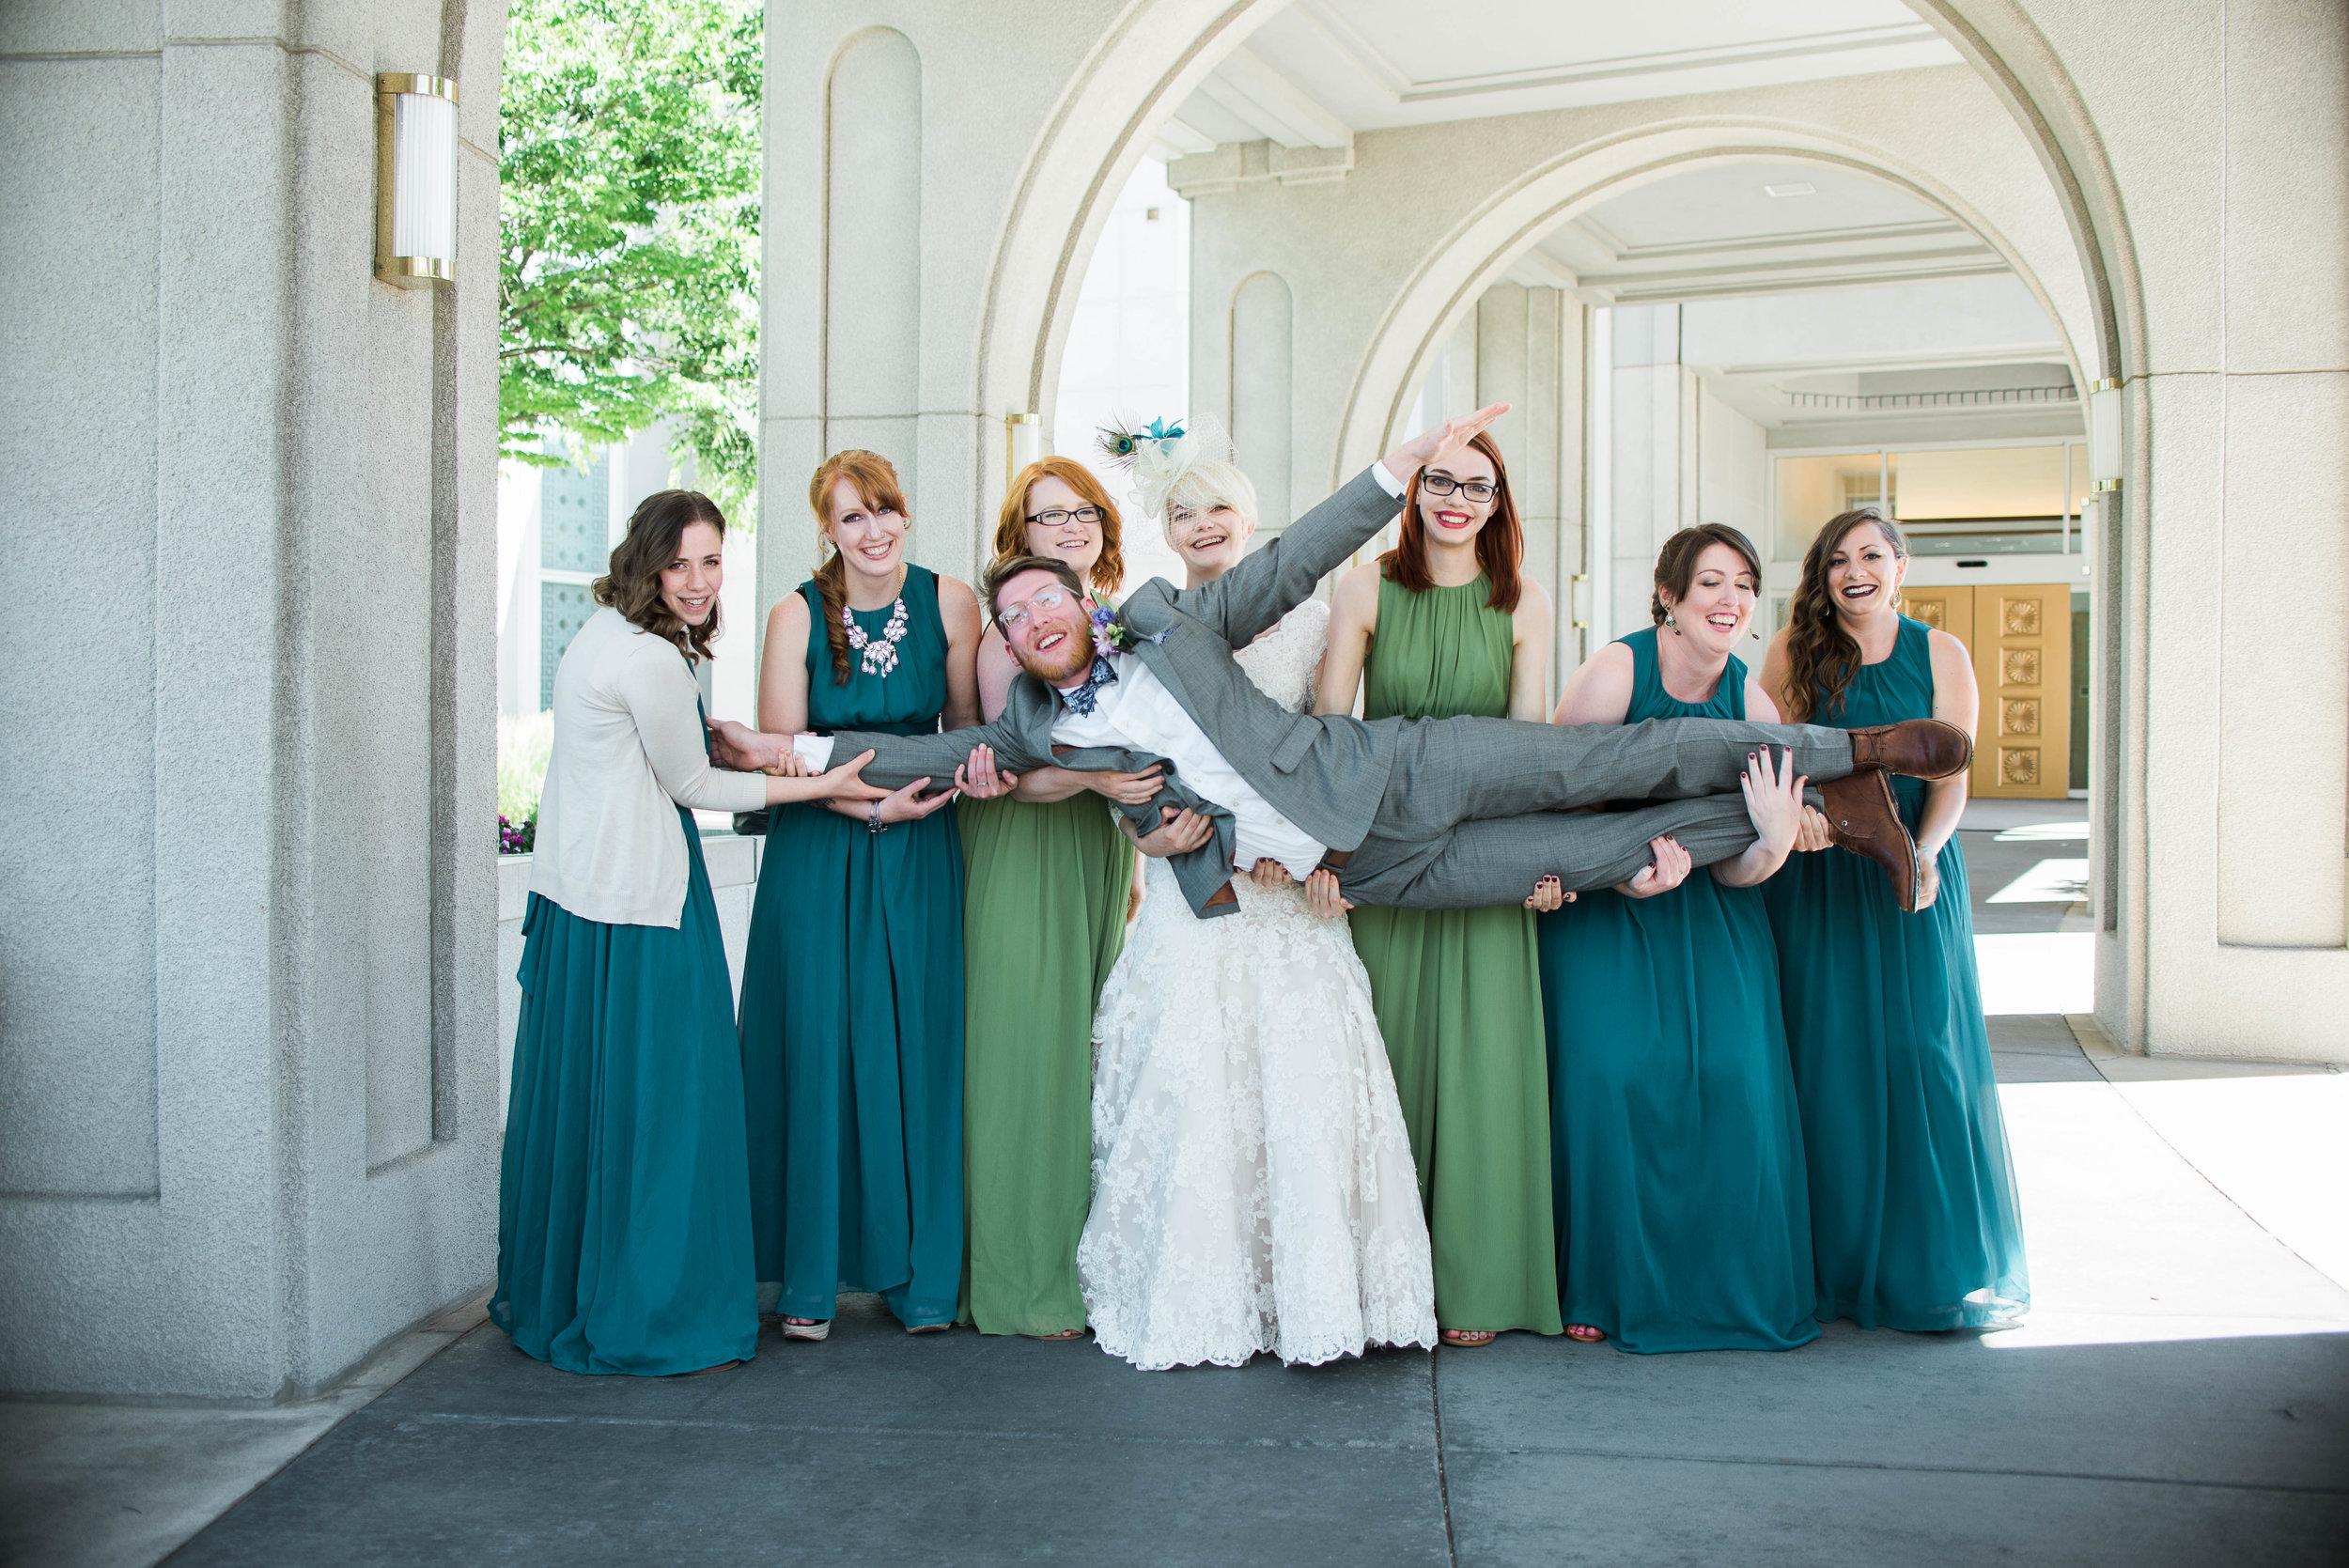 K+M-Wedding-DaySadie_Banks_Photography-519.jpg